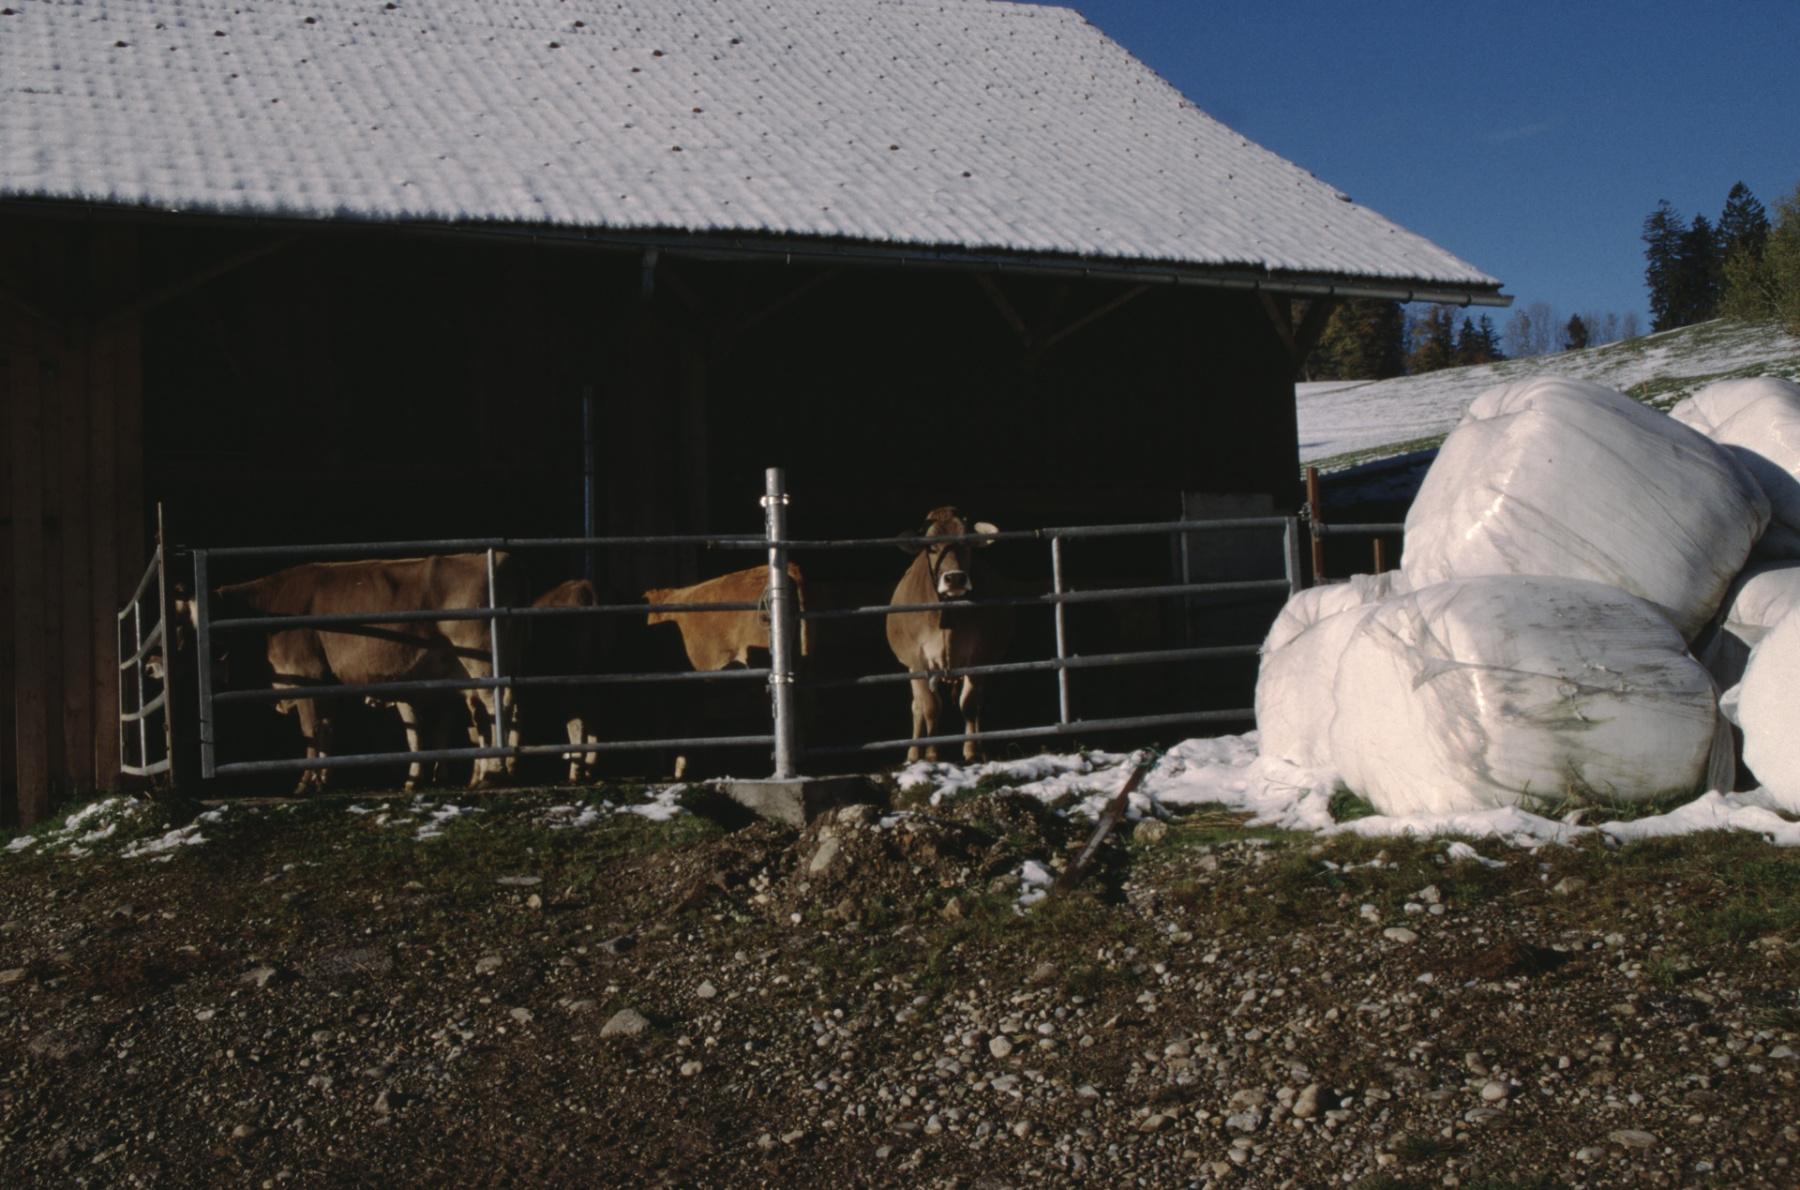 Moderne Landwirtschaft, Kühe öhne Hörner, verpacktes Heu